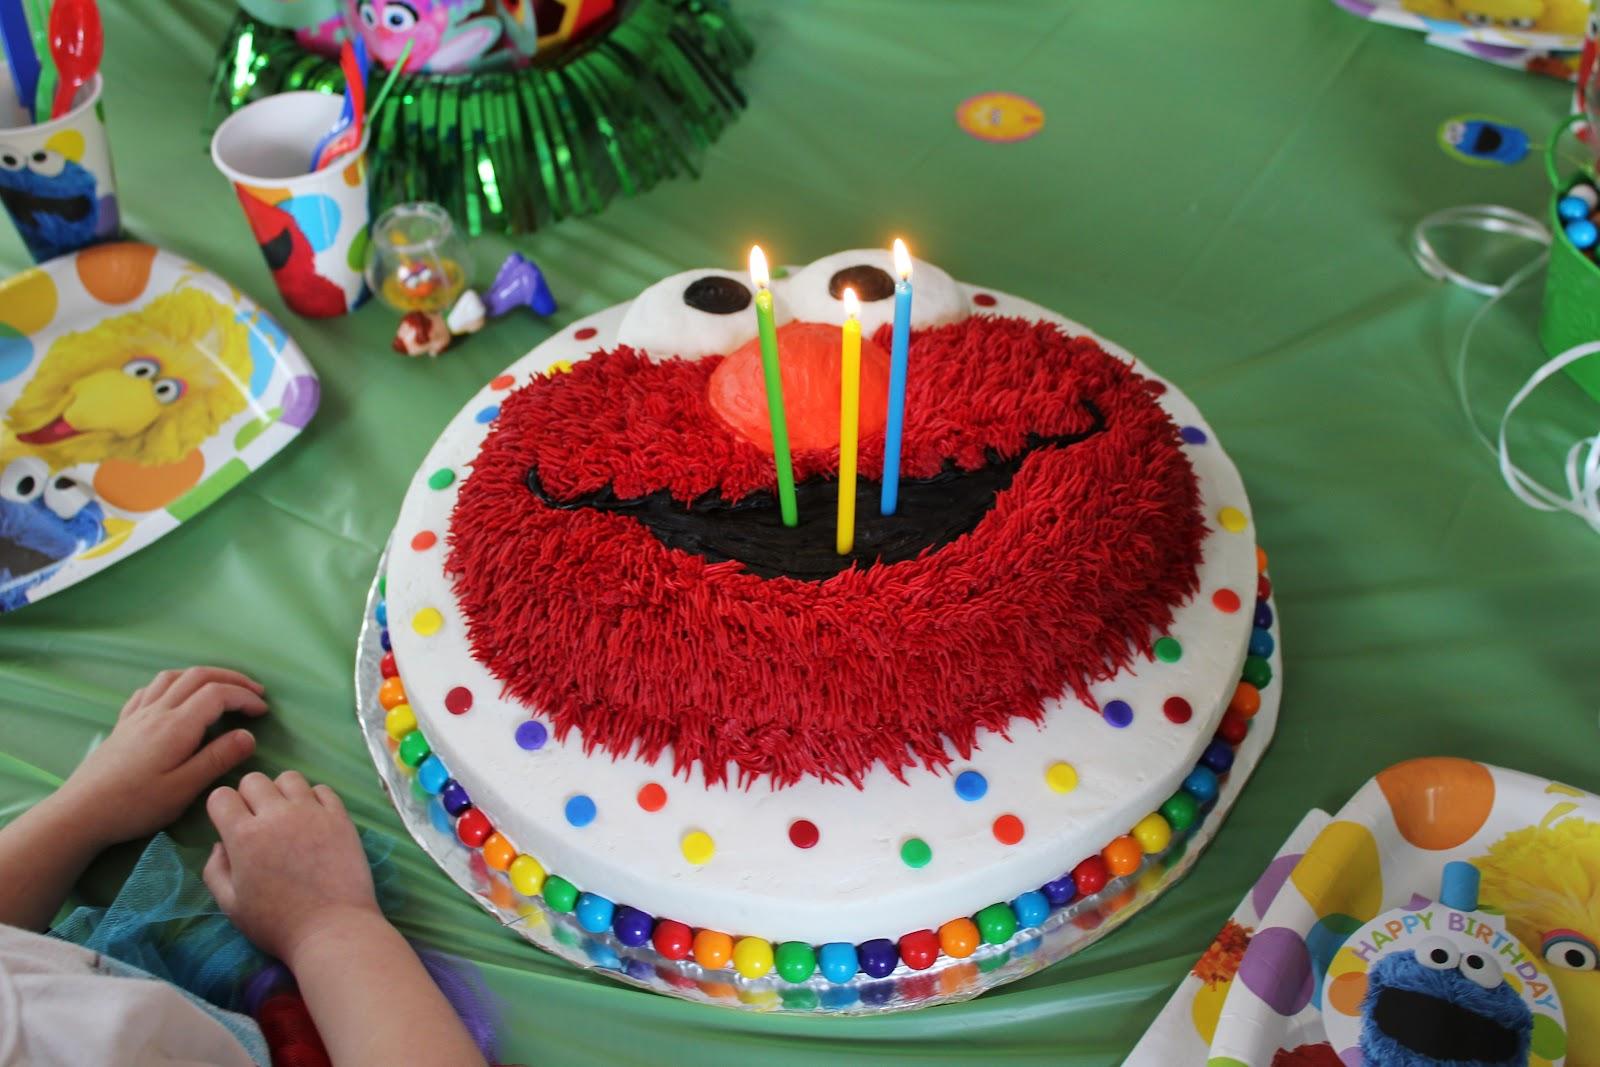 Say It Sweetly Sesame Street Birthday With Elmo Cake April 1 2012